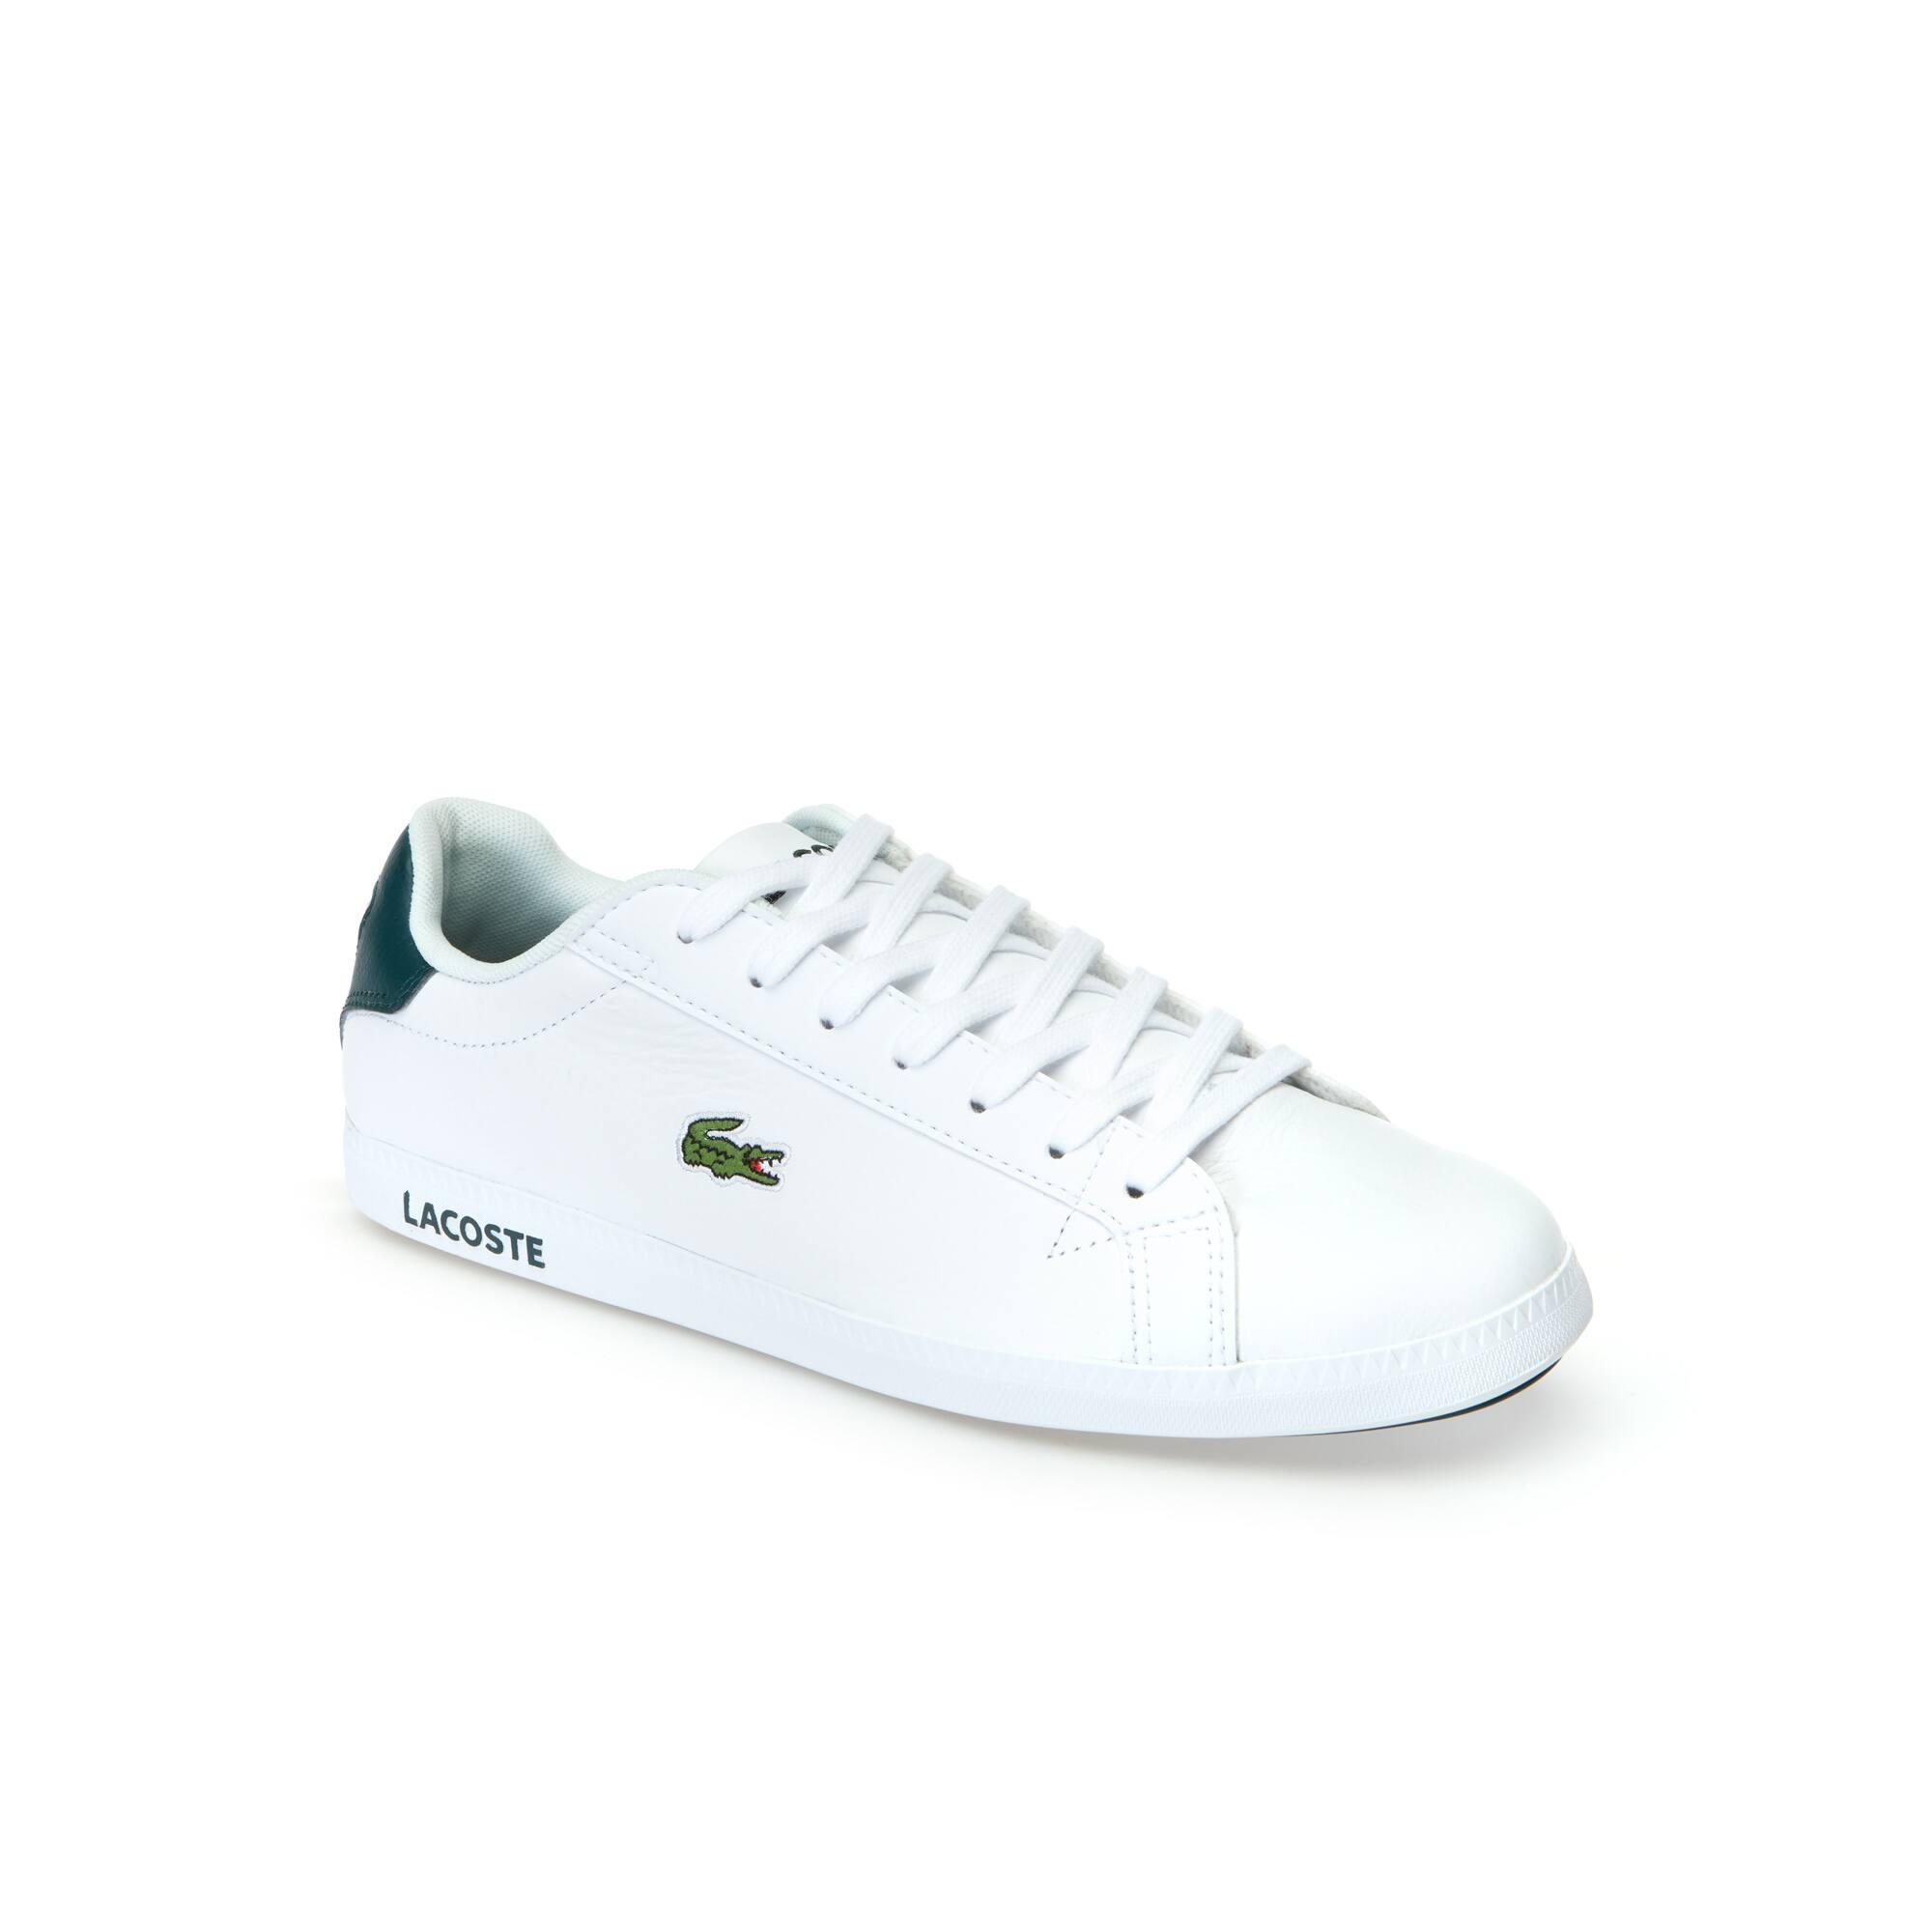 online store d498e 60f2c Herren-Sneaker | Lacoste Herrenschuhe | LACOSTE